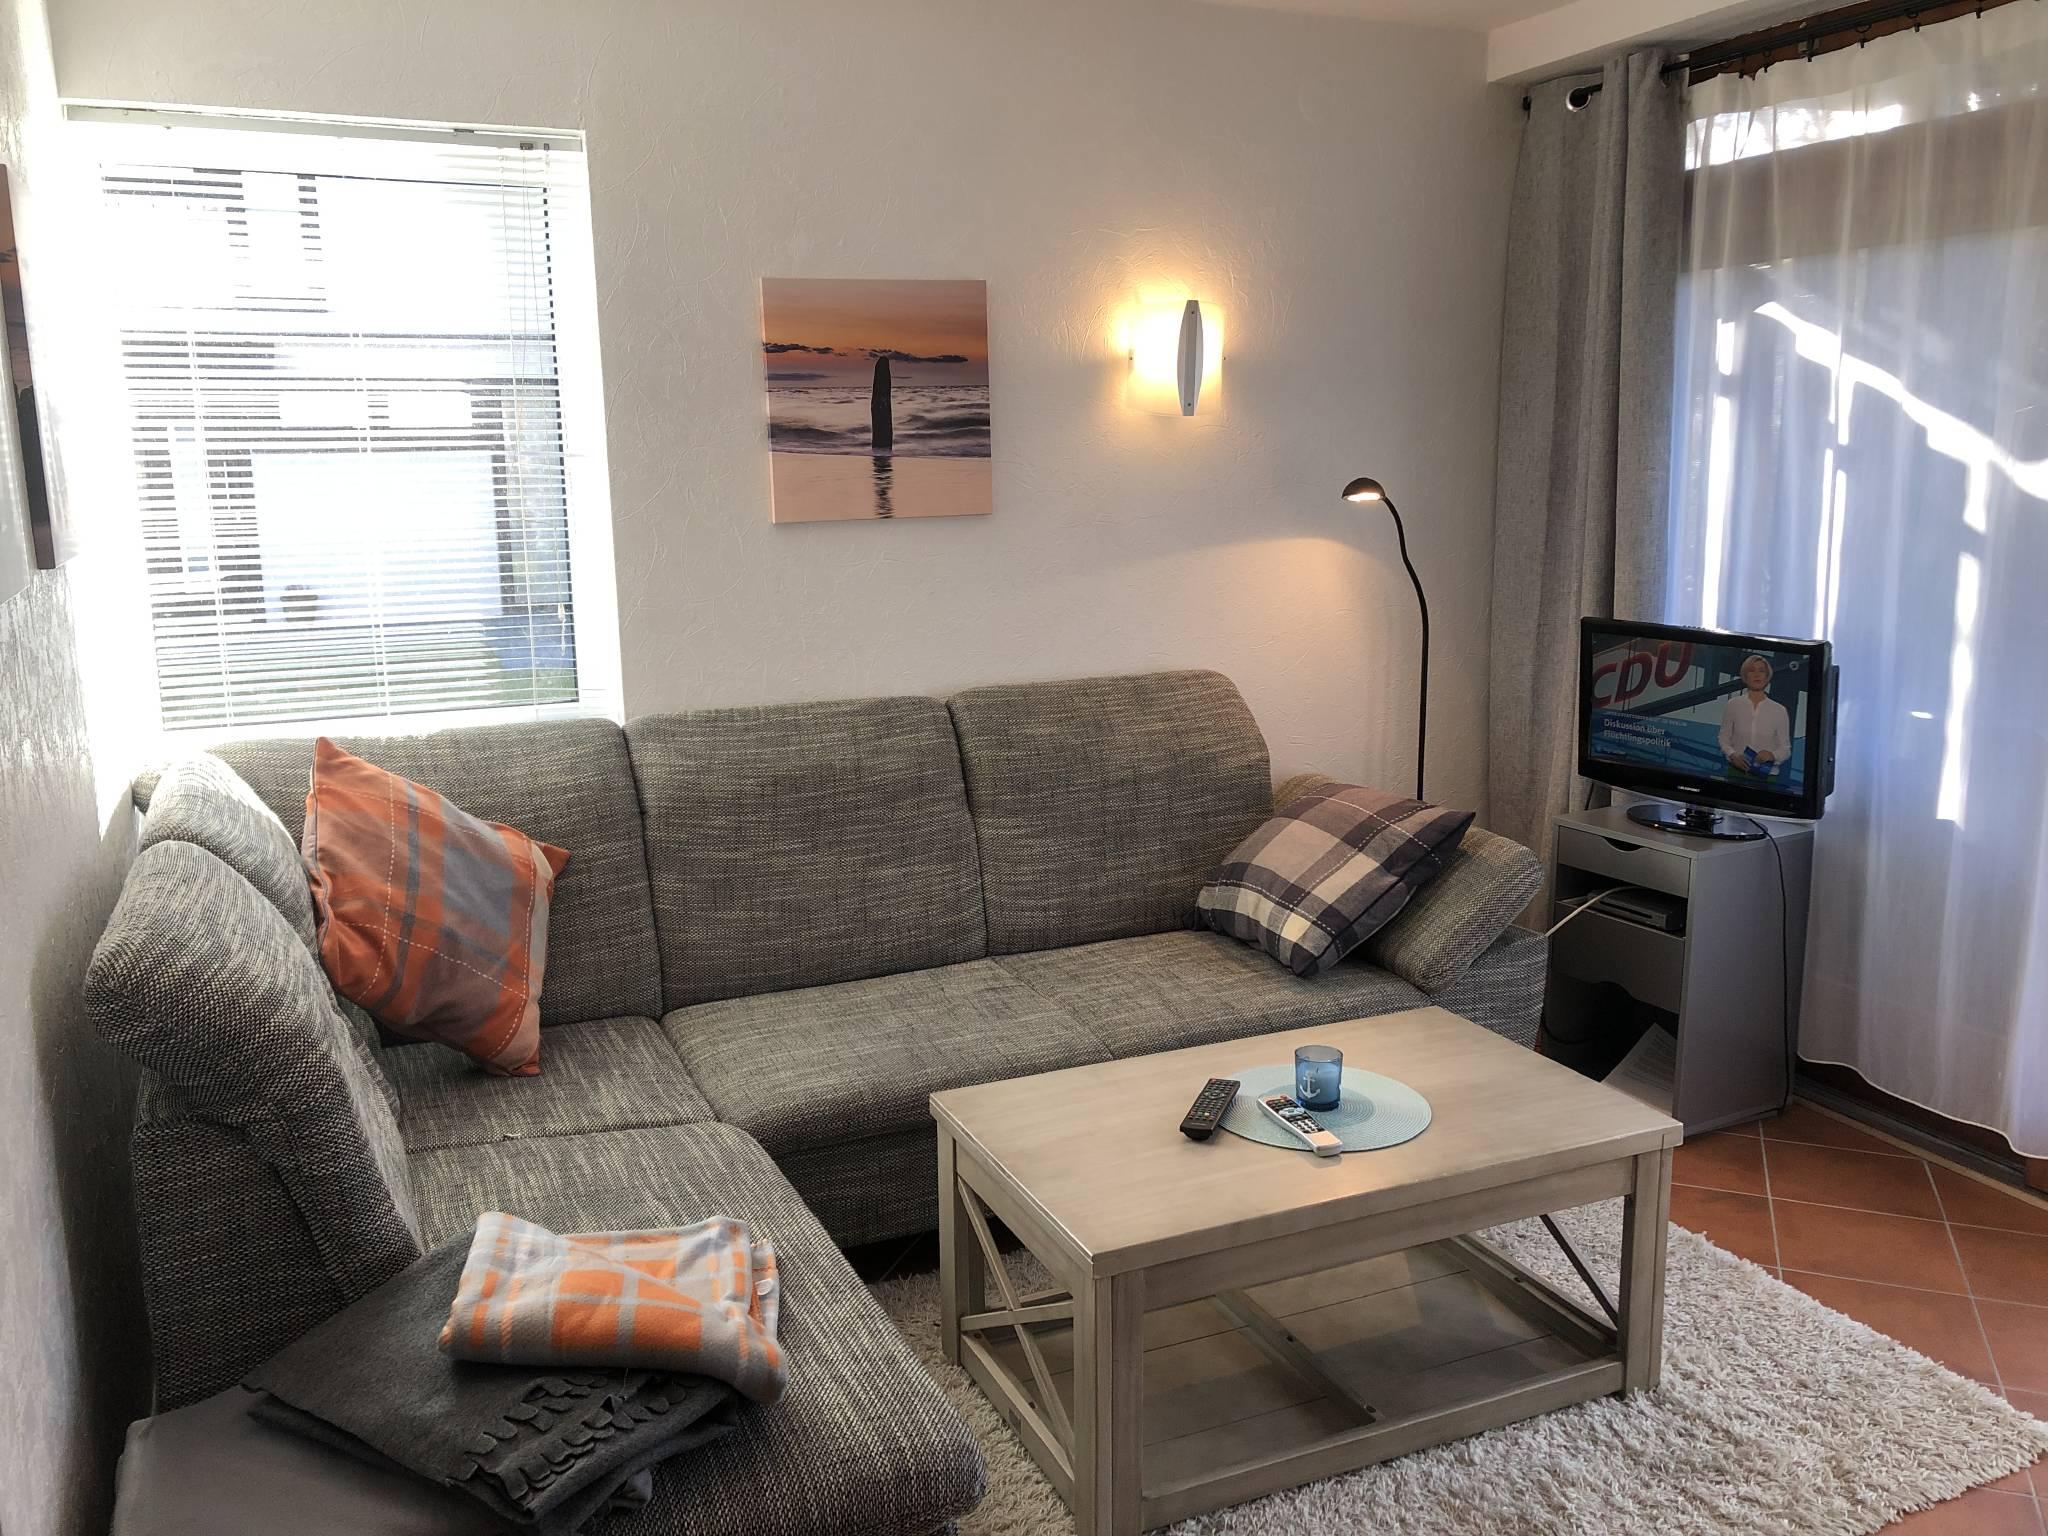 Sofa und TV